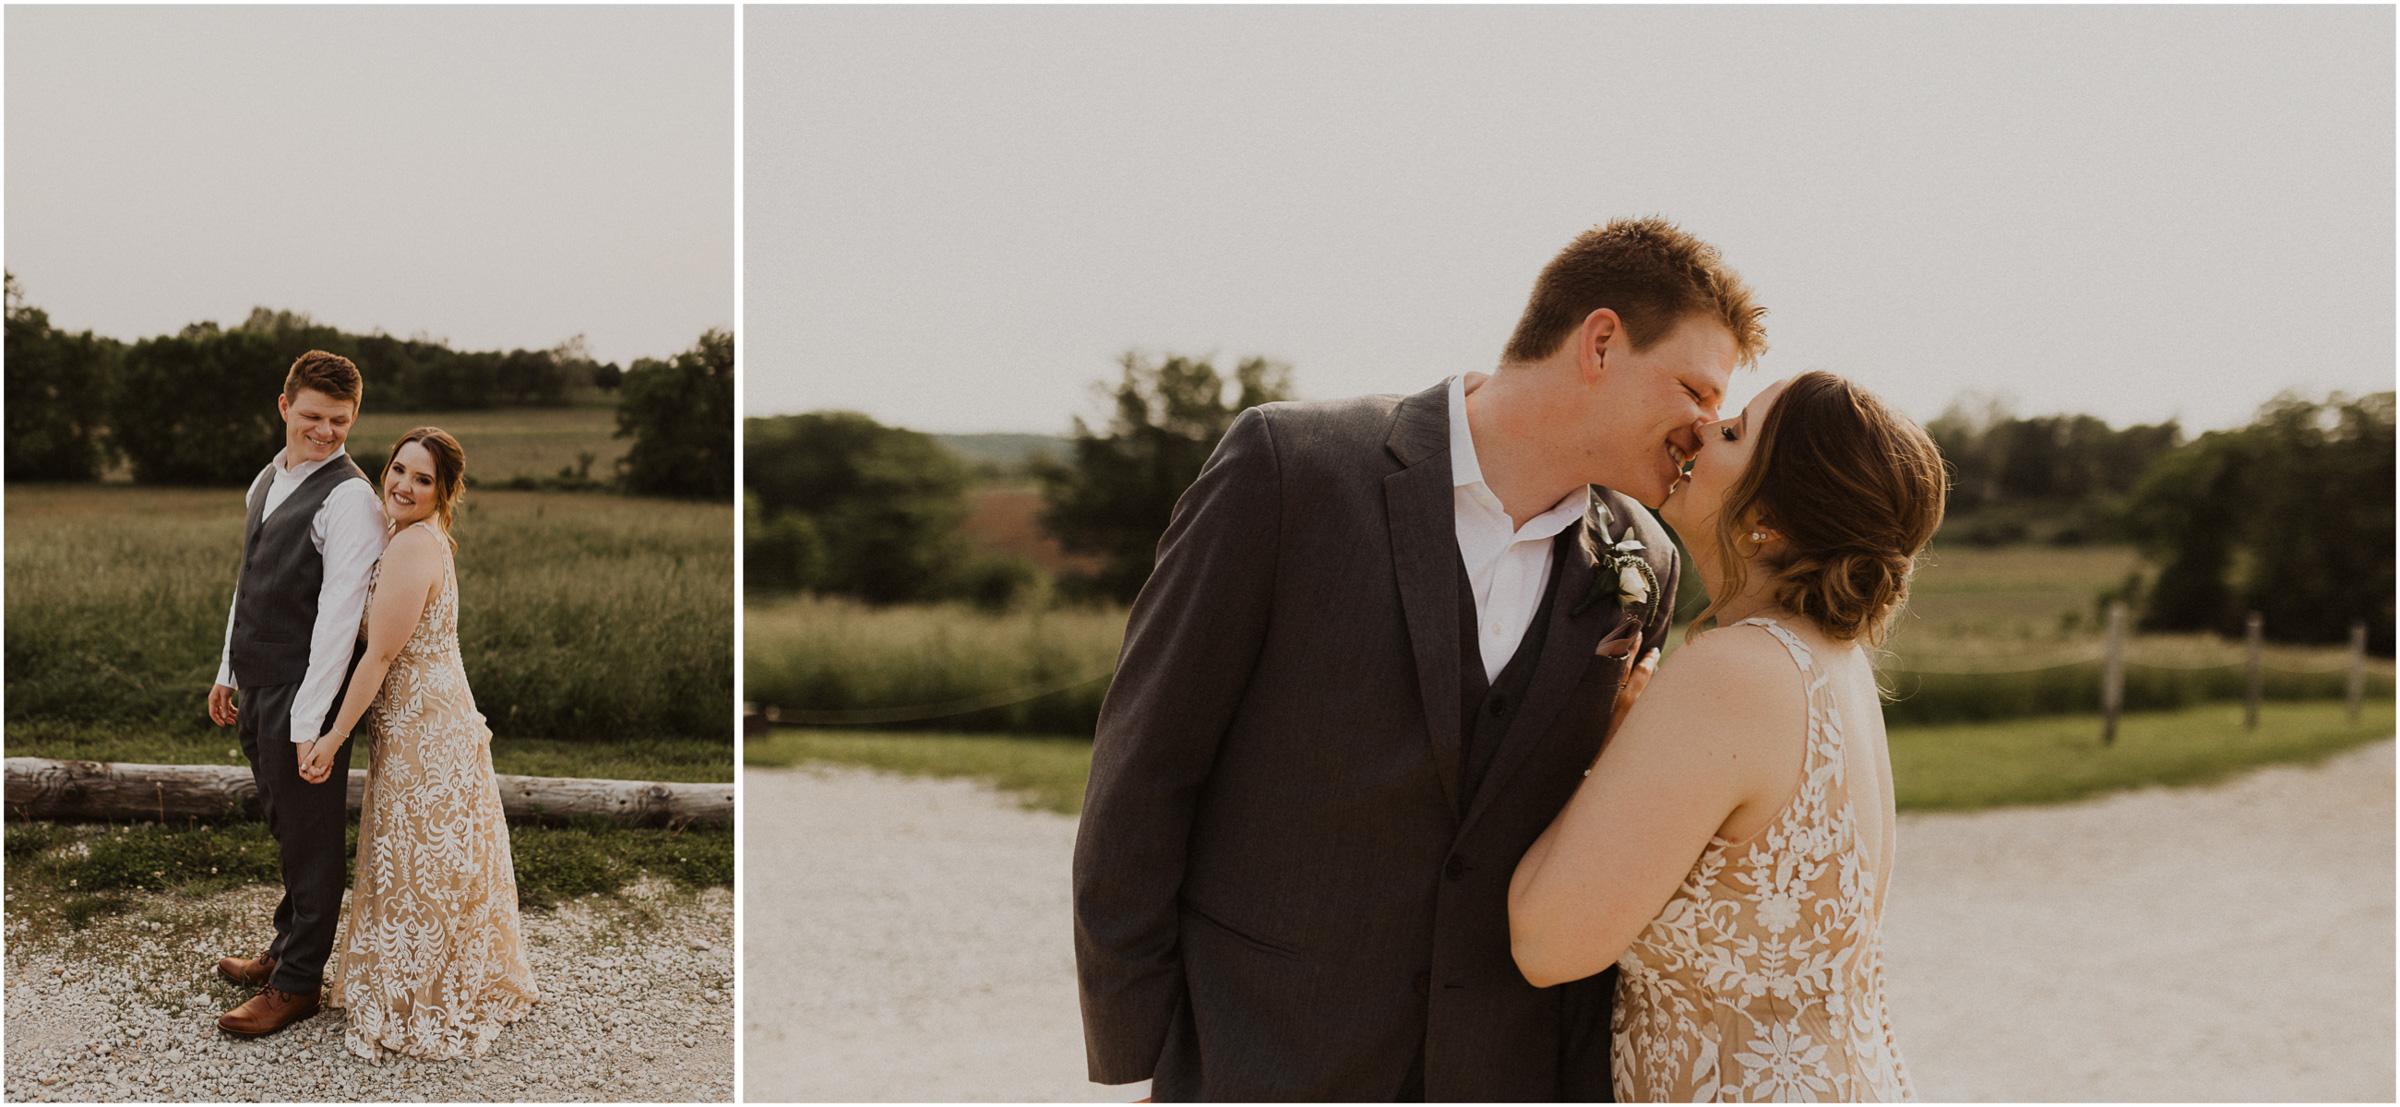 alyssa barletter photography weston red barn farm timberbarn summer outdoor wedding-54.jpg